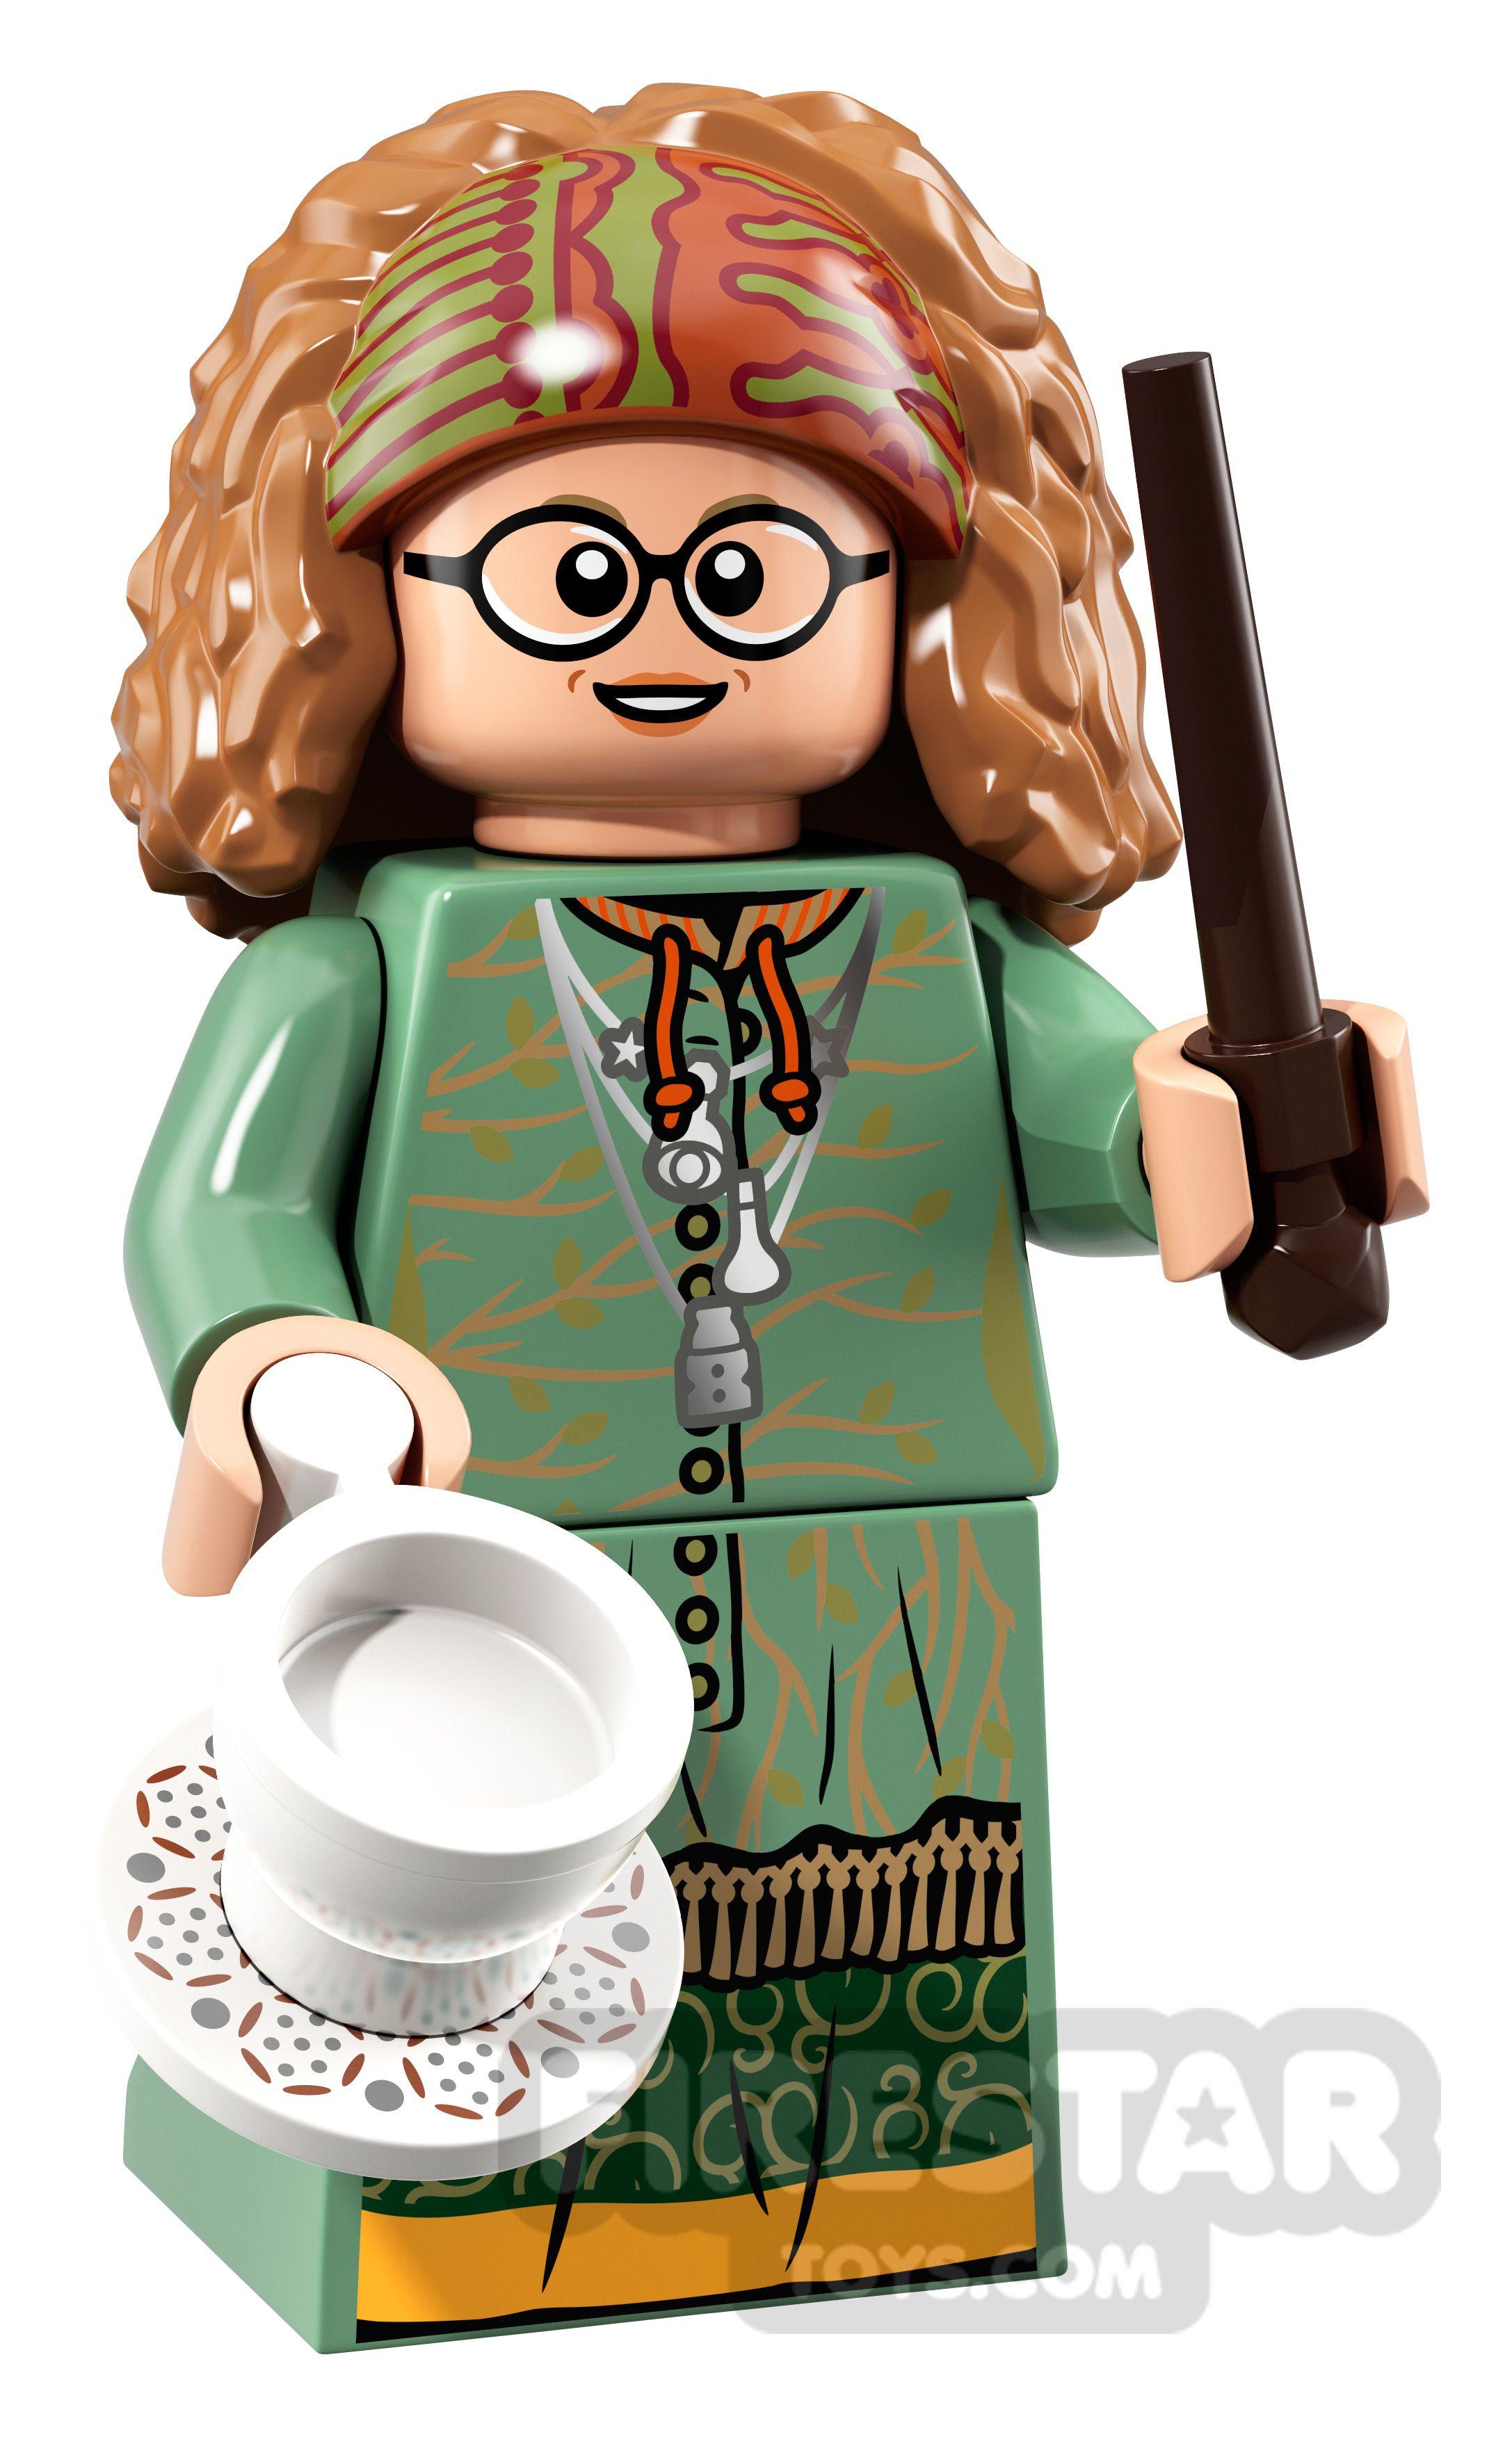 Lego Harry Potter Minifigures 71022 Wizarding World Professor